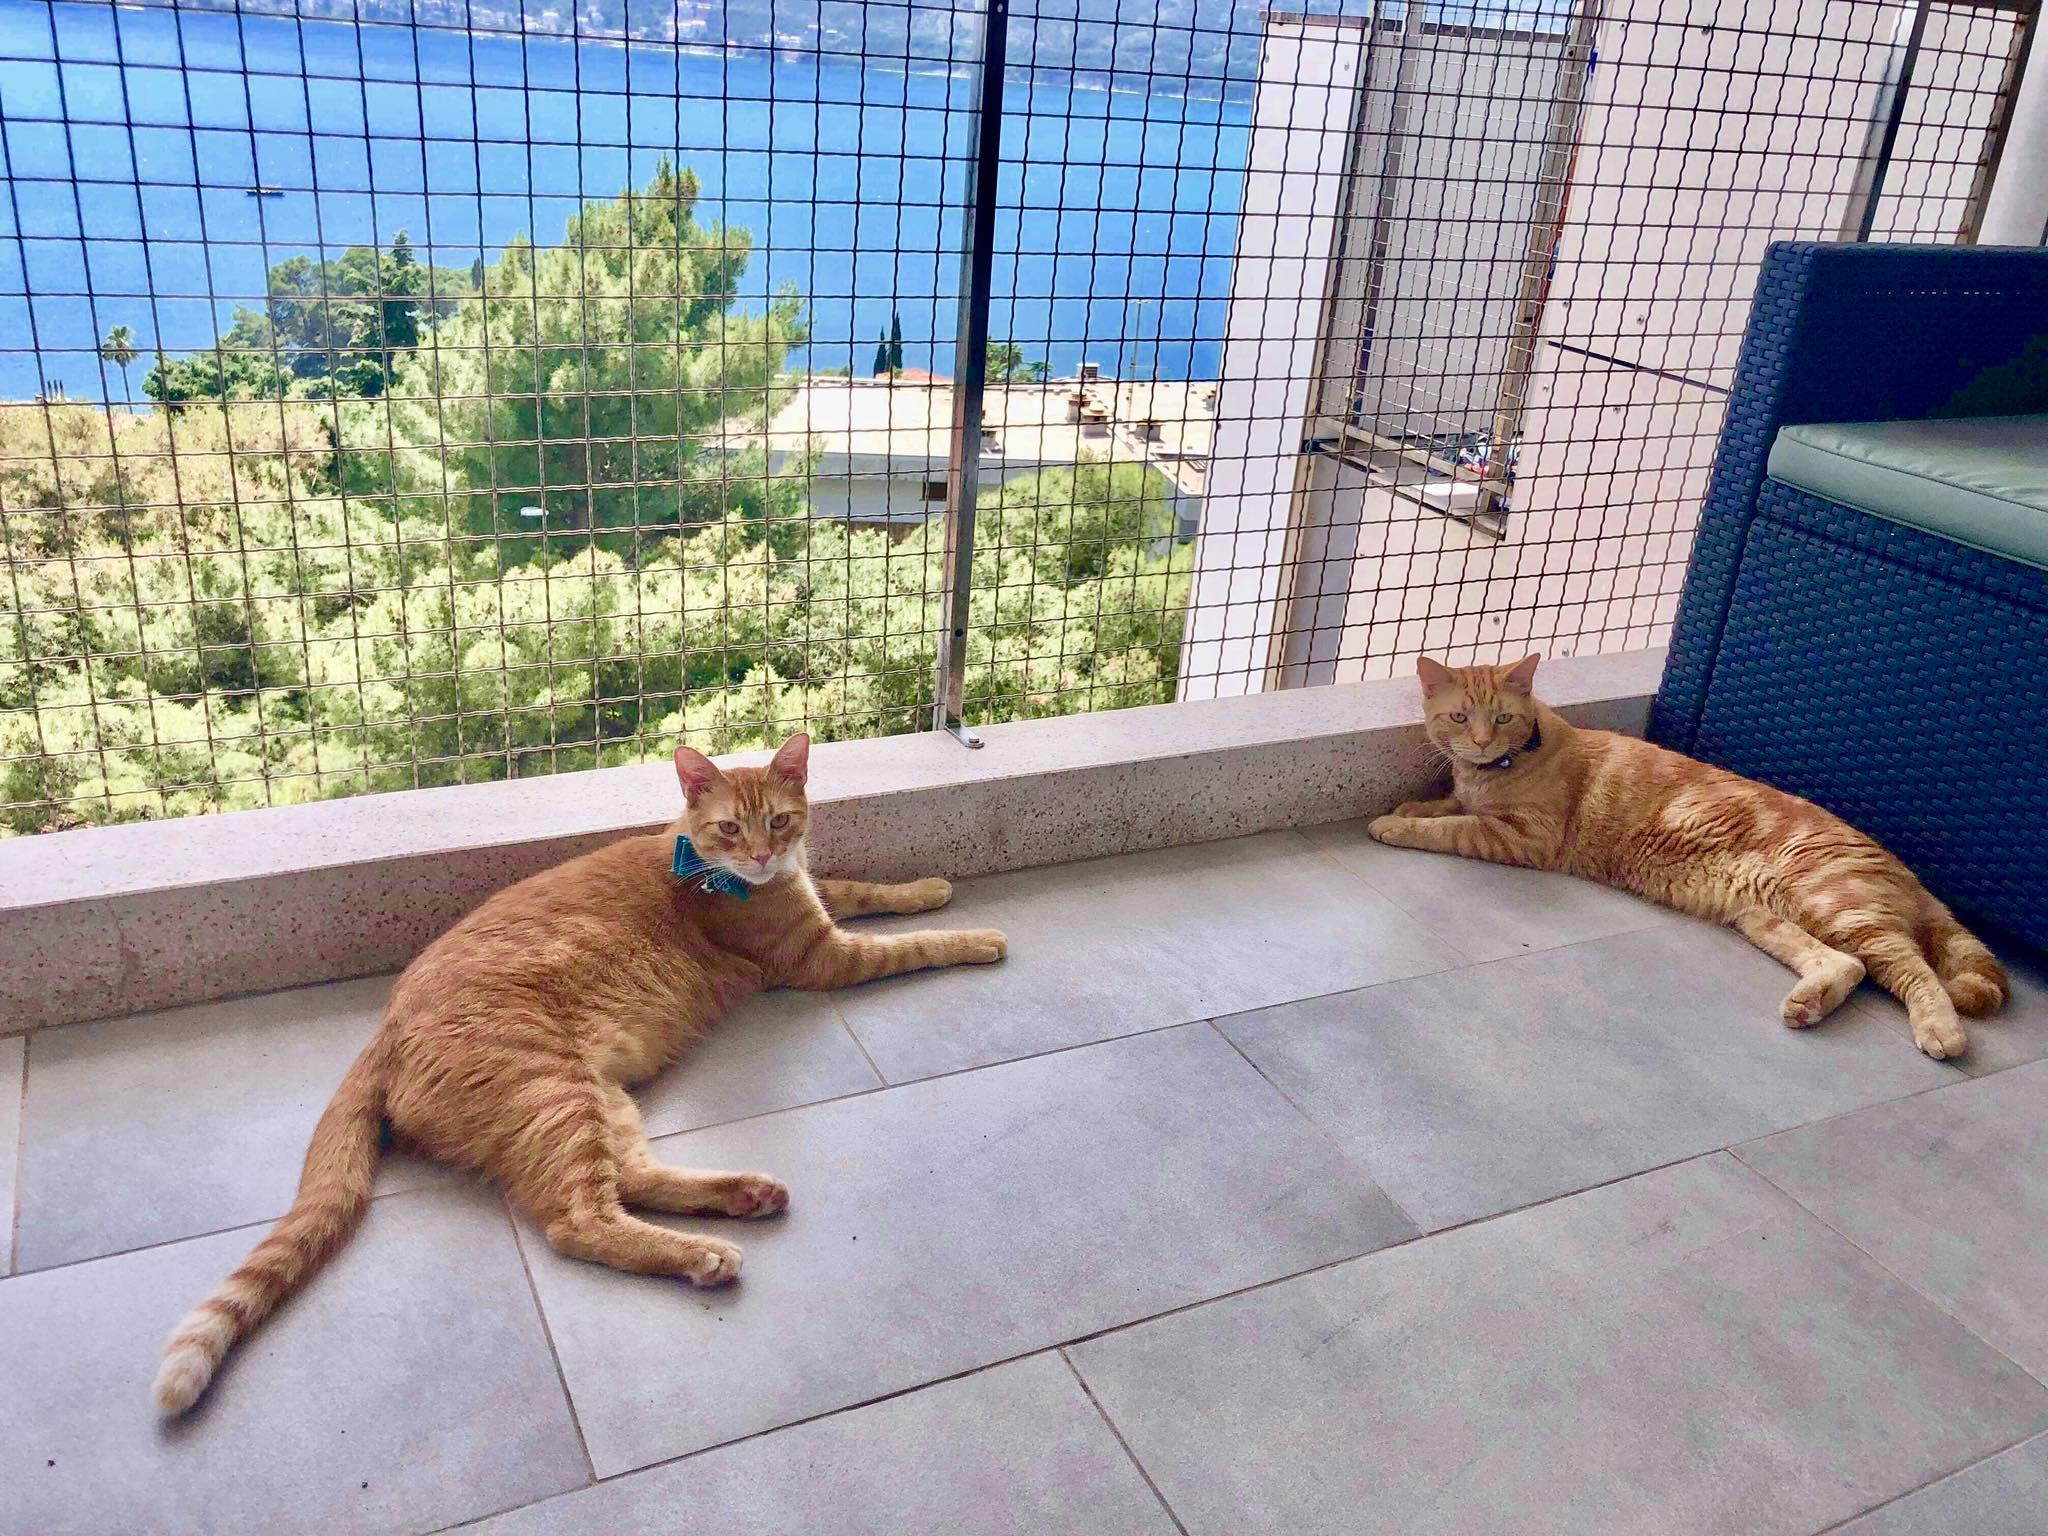 Expat Life in Montenegro Day 27 Captain Ahab & Little Zissou in Montenegro.jpg